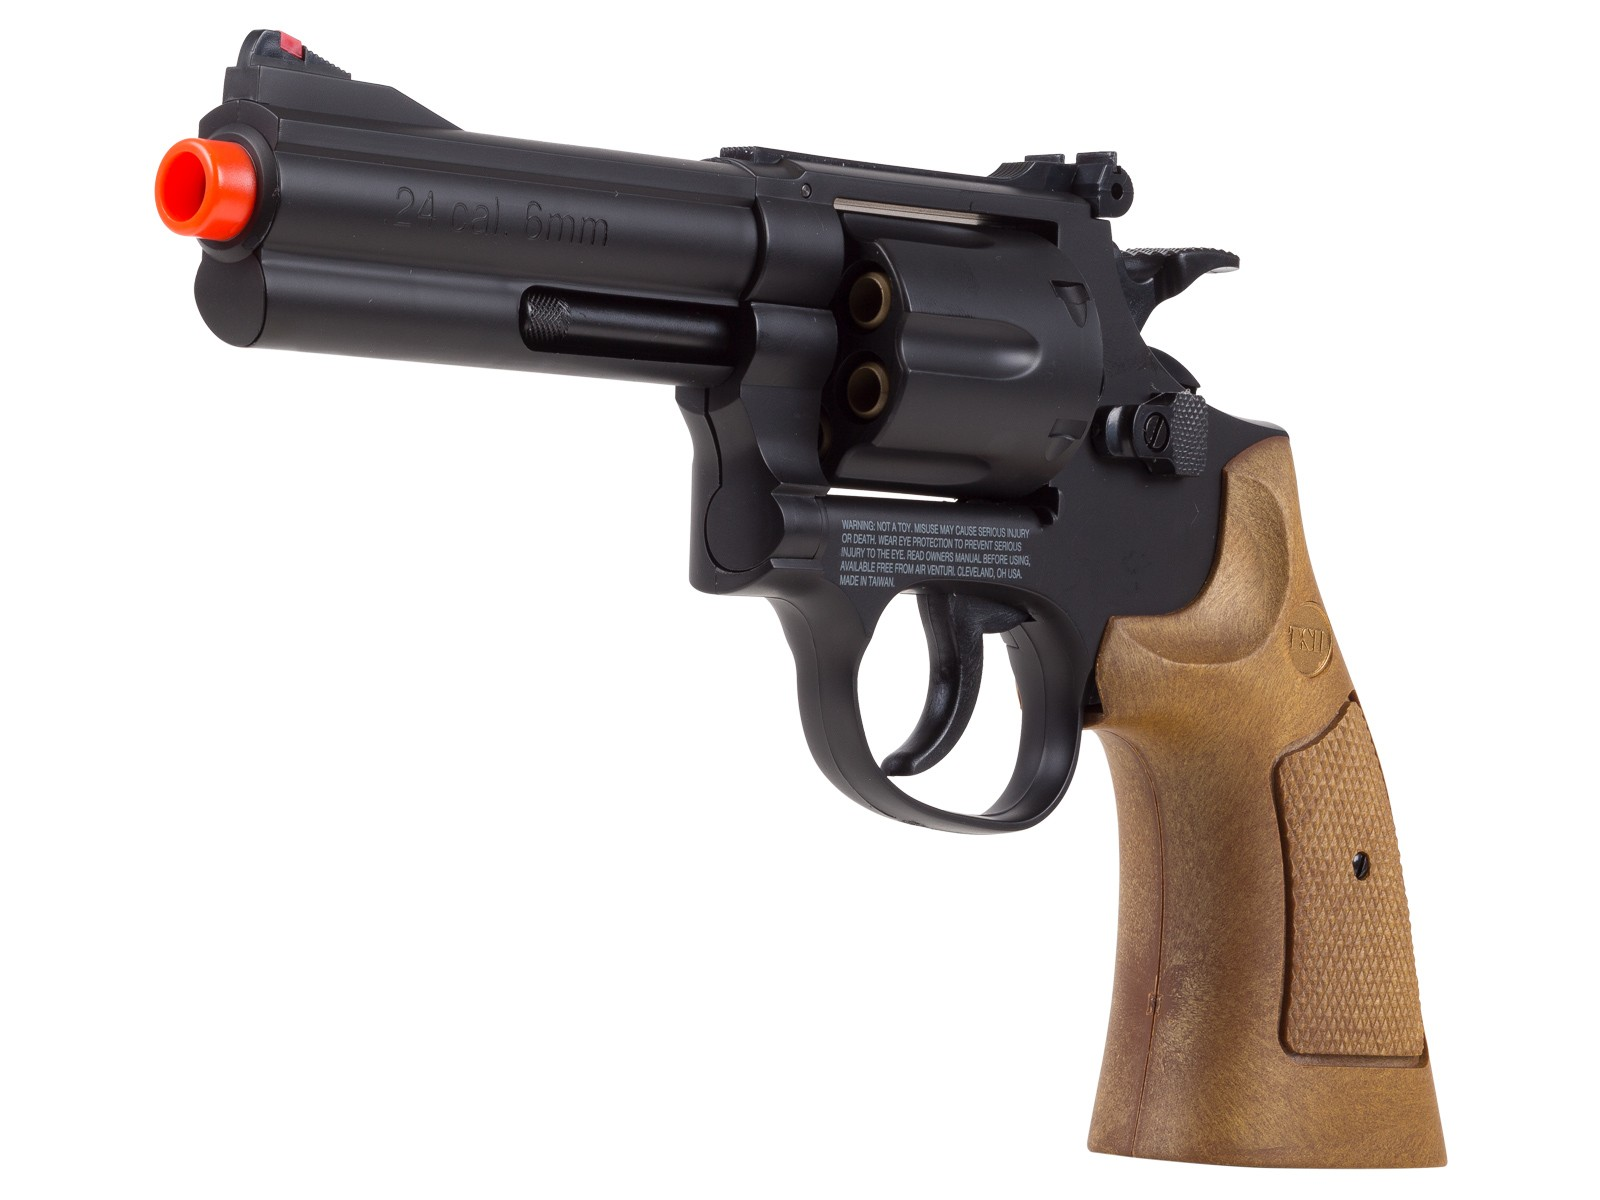 TSD_Sports_Spring_Revolver_933_4_Barrel_Brown_6mm